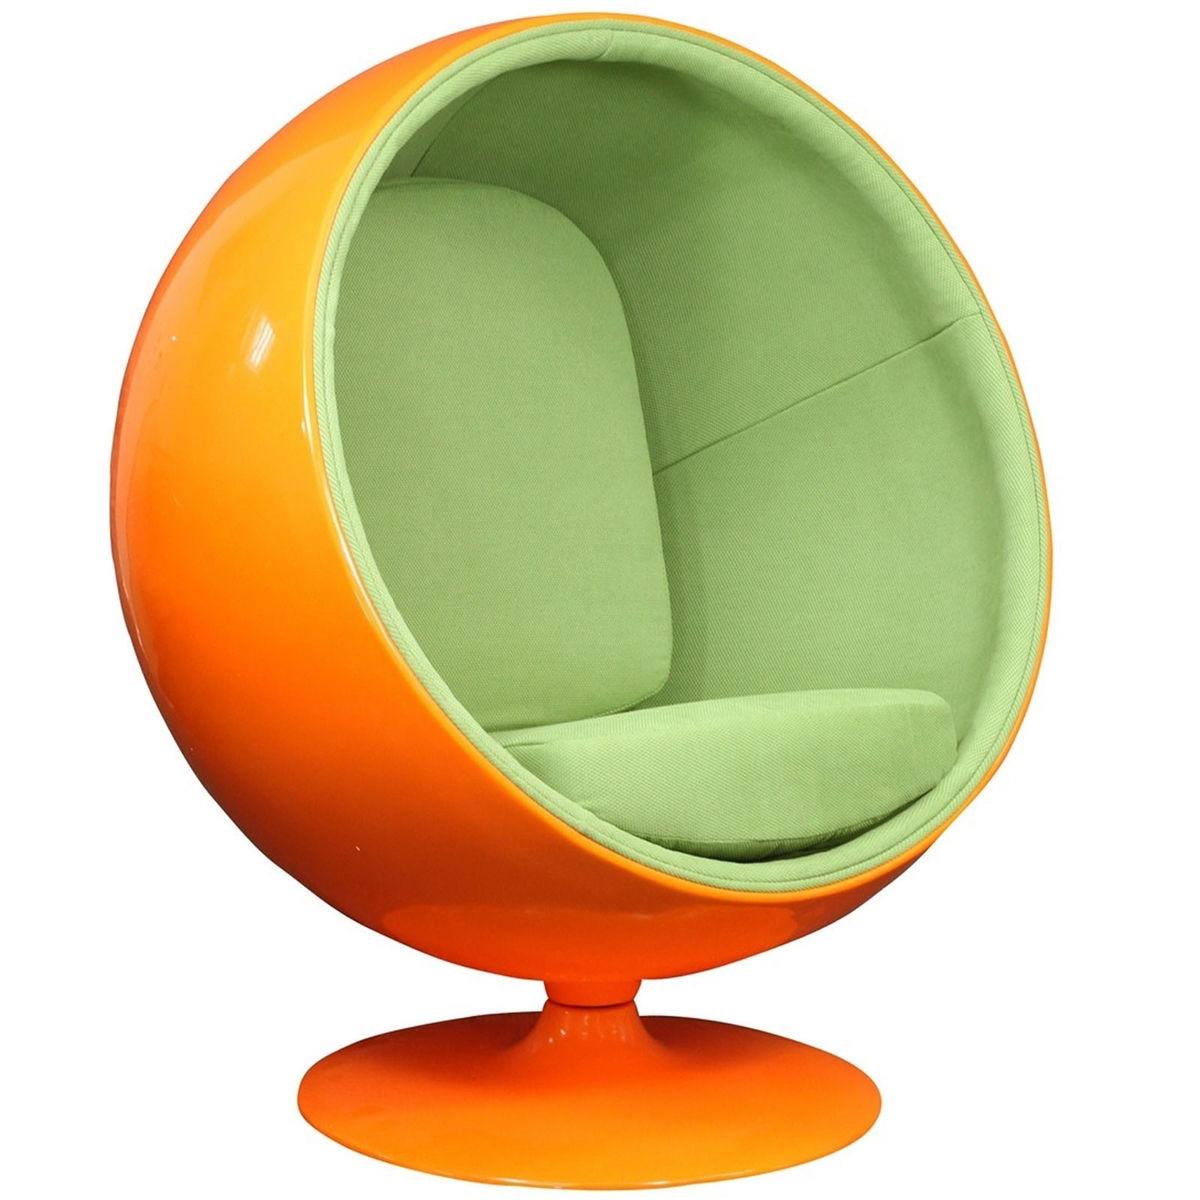 ball chairs chair covers rental in elizabeth nj eero aarnio modern reproduction